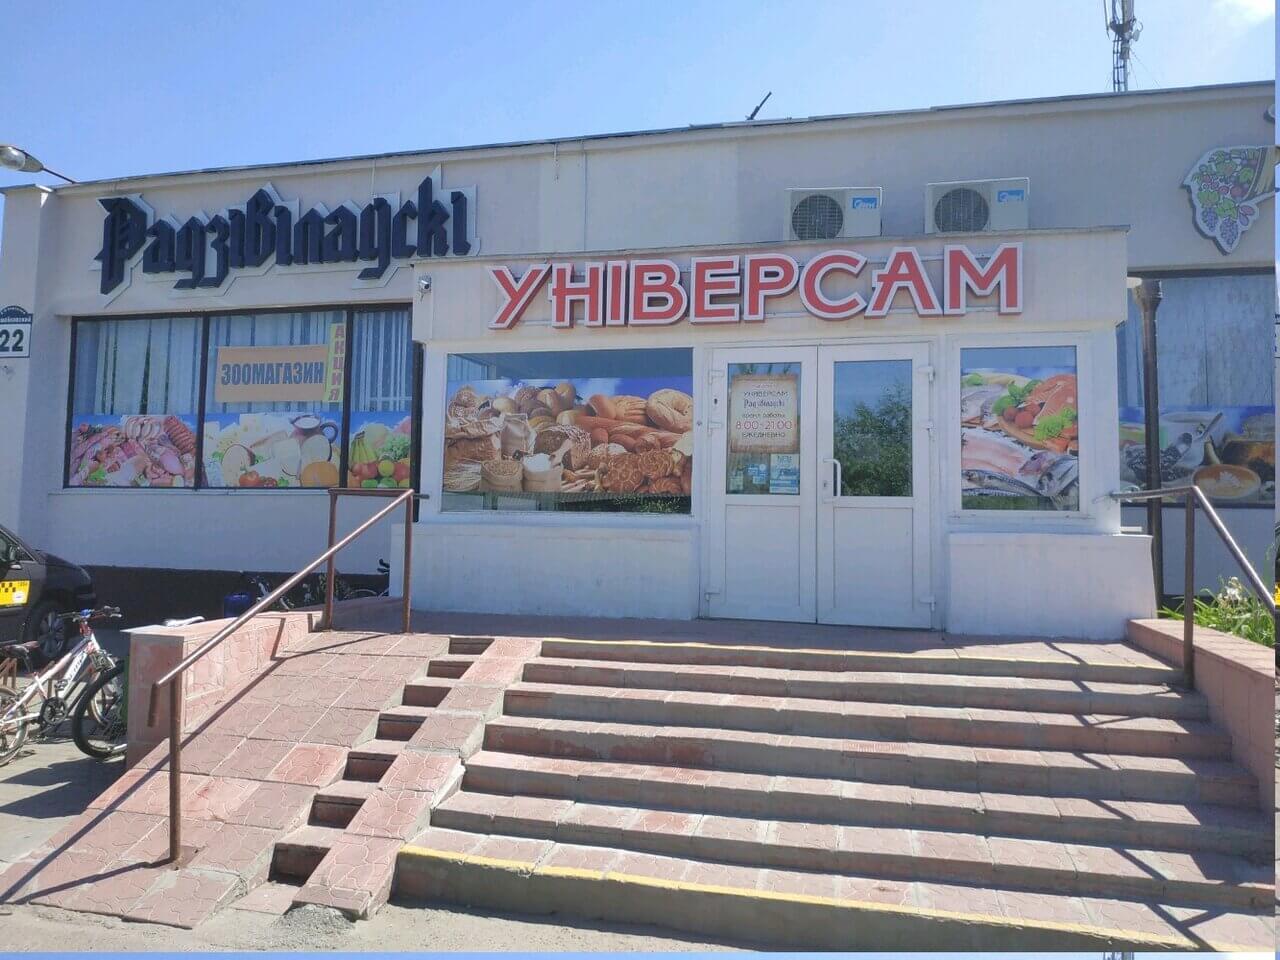 Эваакуатор Сельхозпосёлок Сельхозпосёлок 1-й переулок Измайловский;